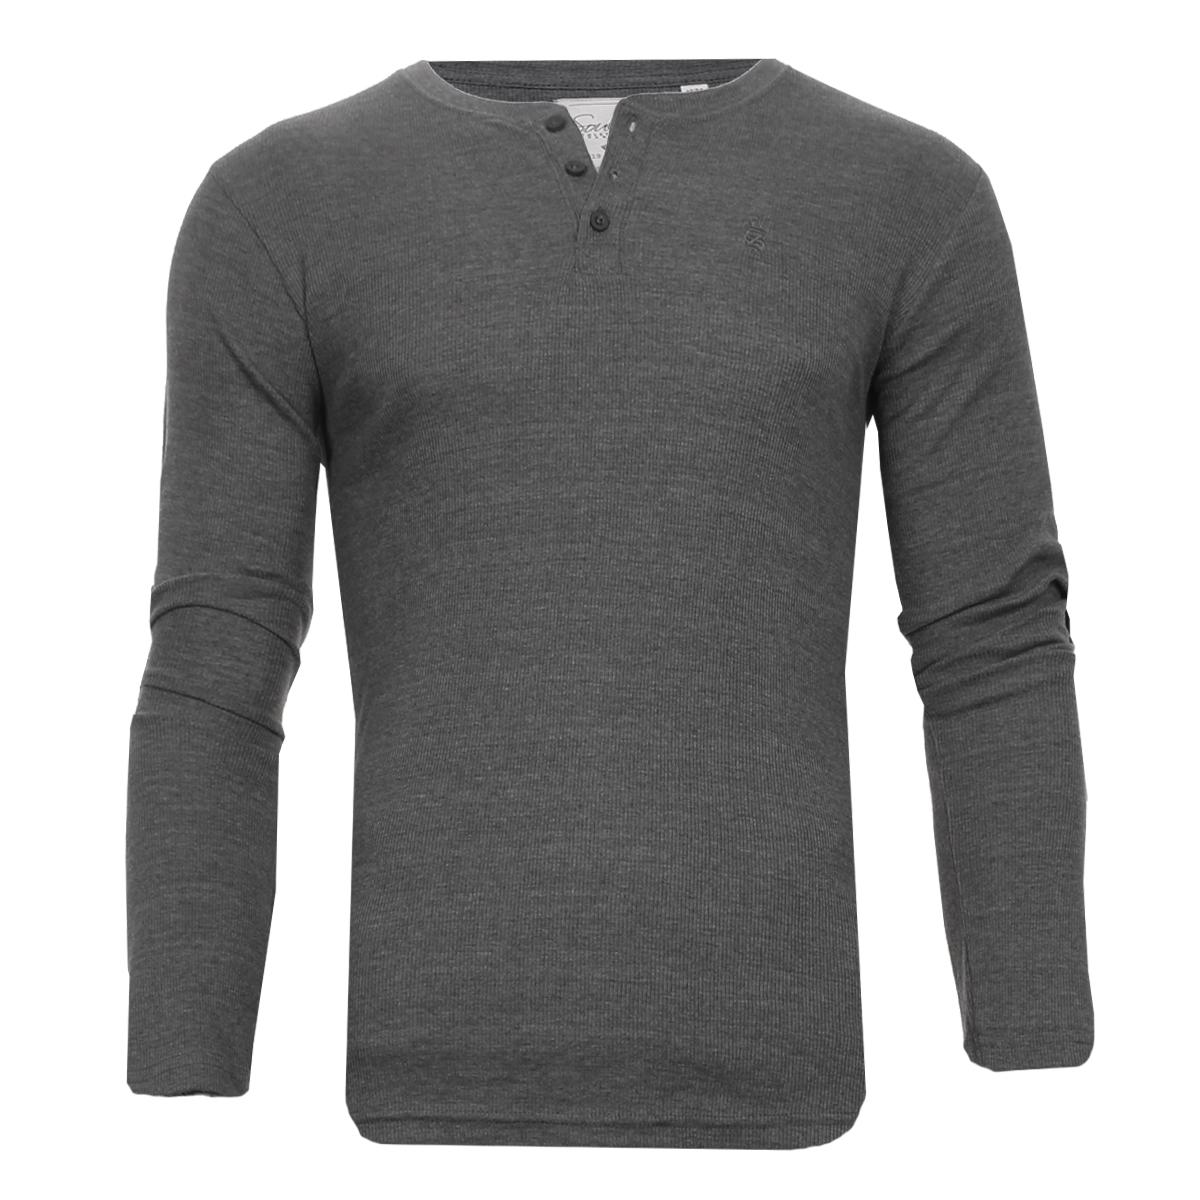 Men-Grandad-T-Shirt-Long-Sleeve-Jersey-Ribbed-Top-Cotton-Rich-Brave-Soul thumbnail 38